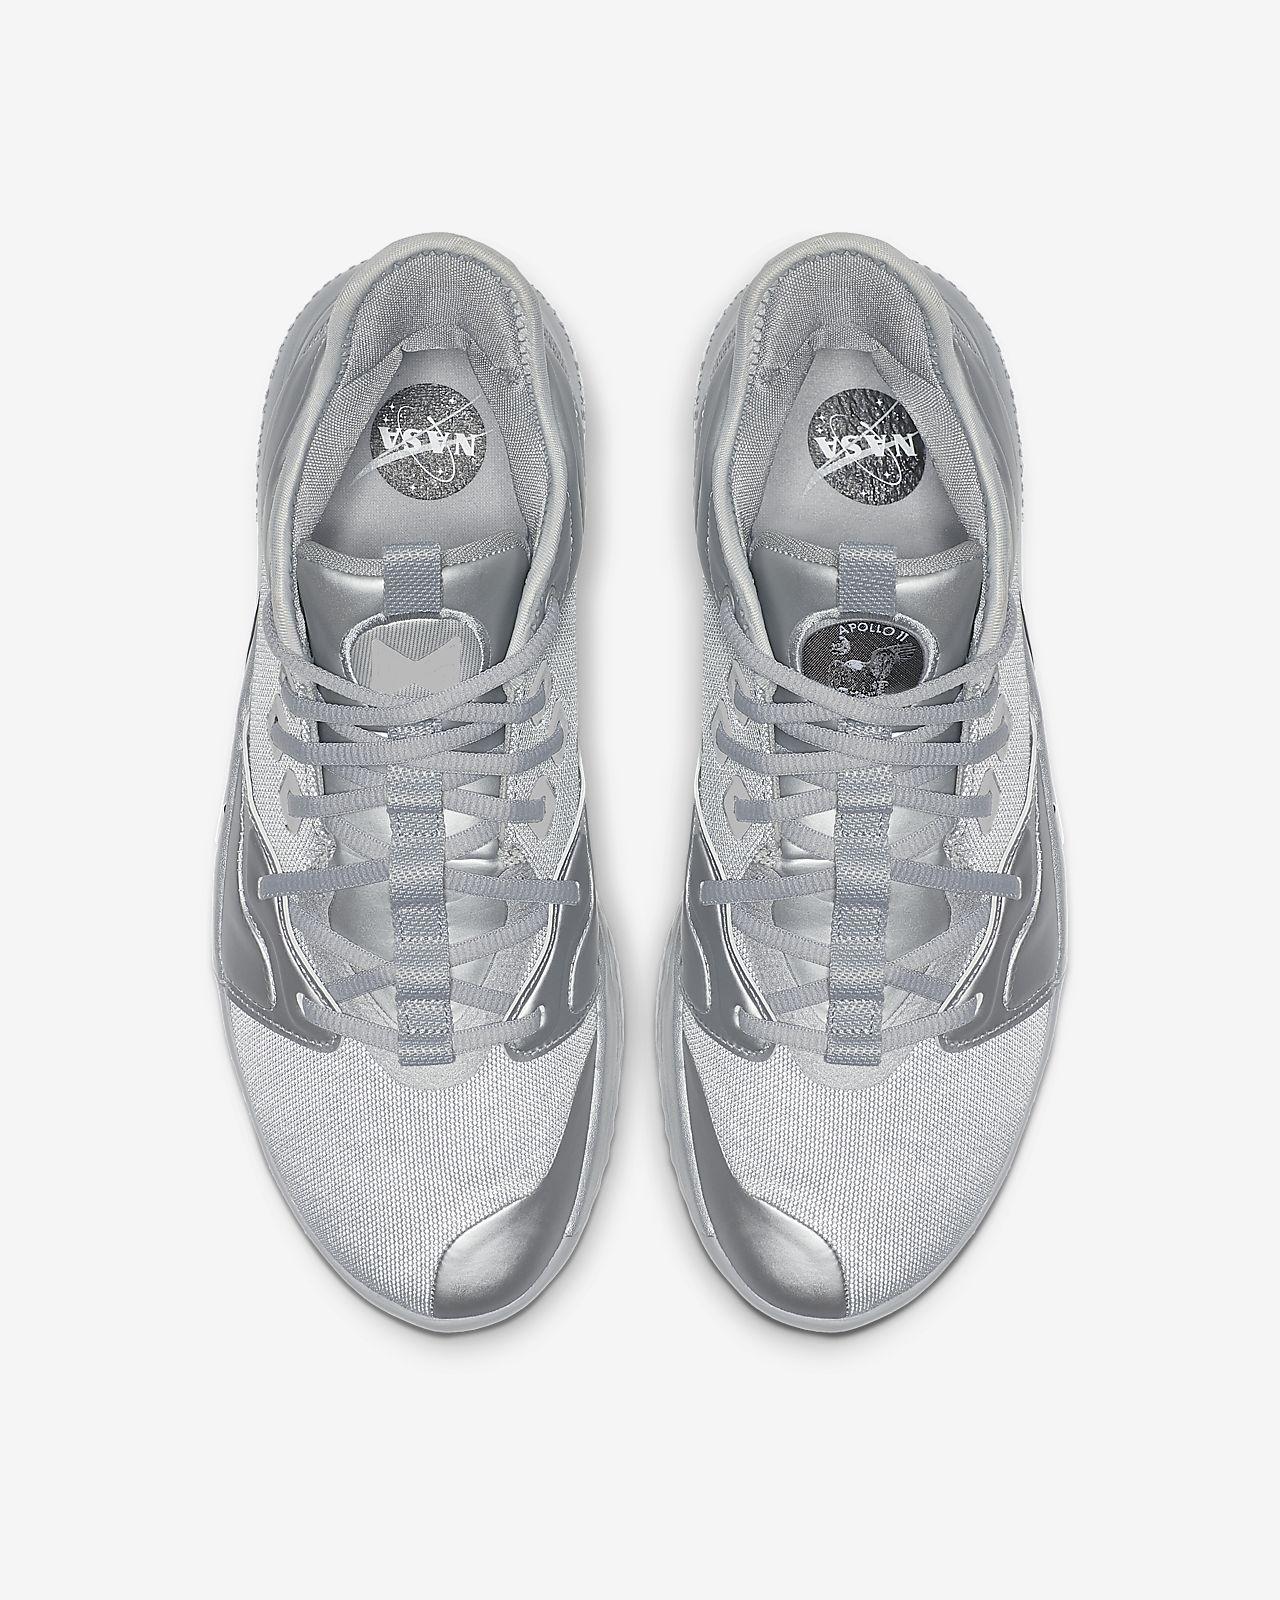 De Chaussure Nasa Basketball 3 Pg eDIWH9bYE2